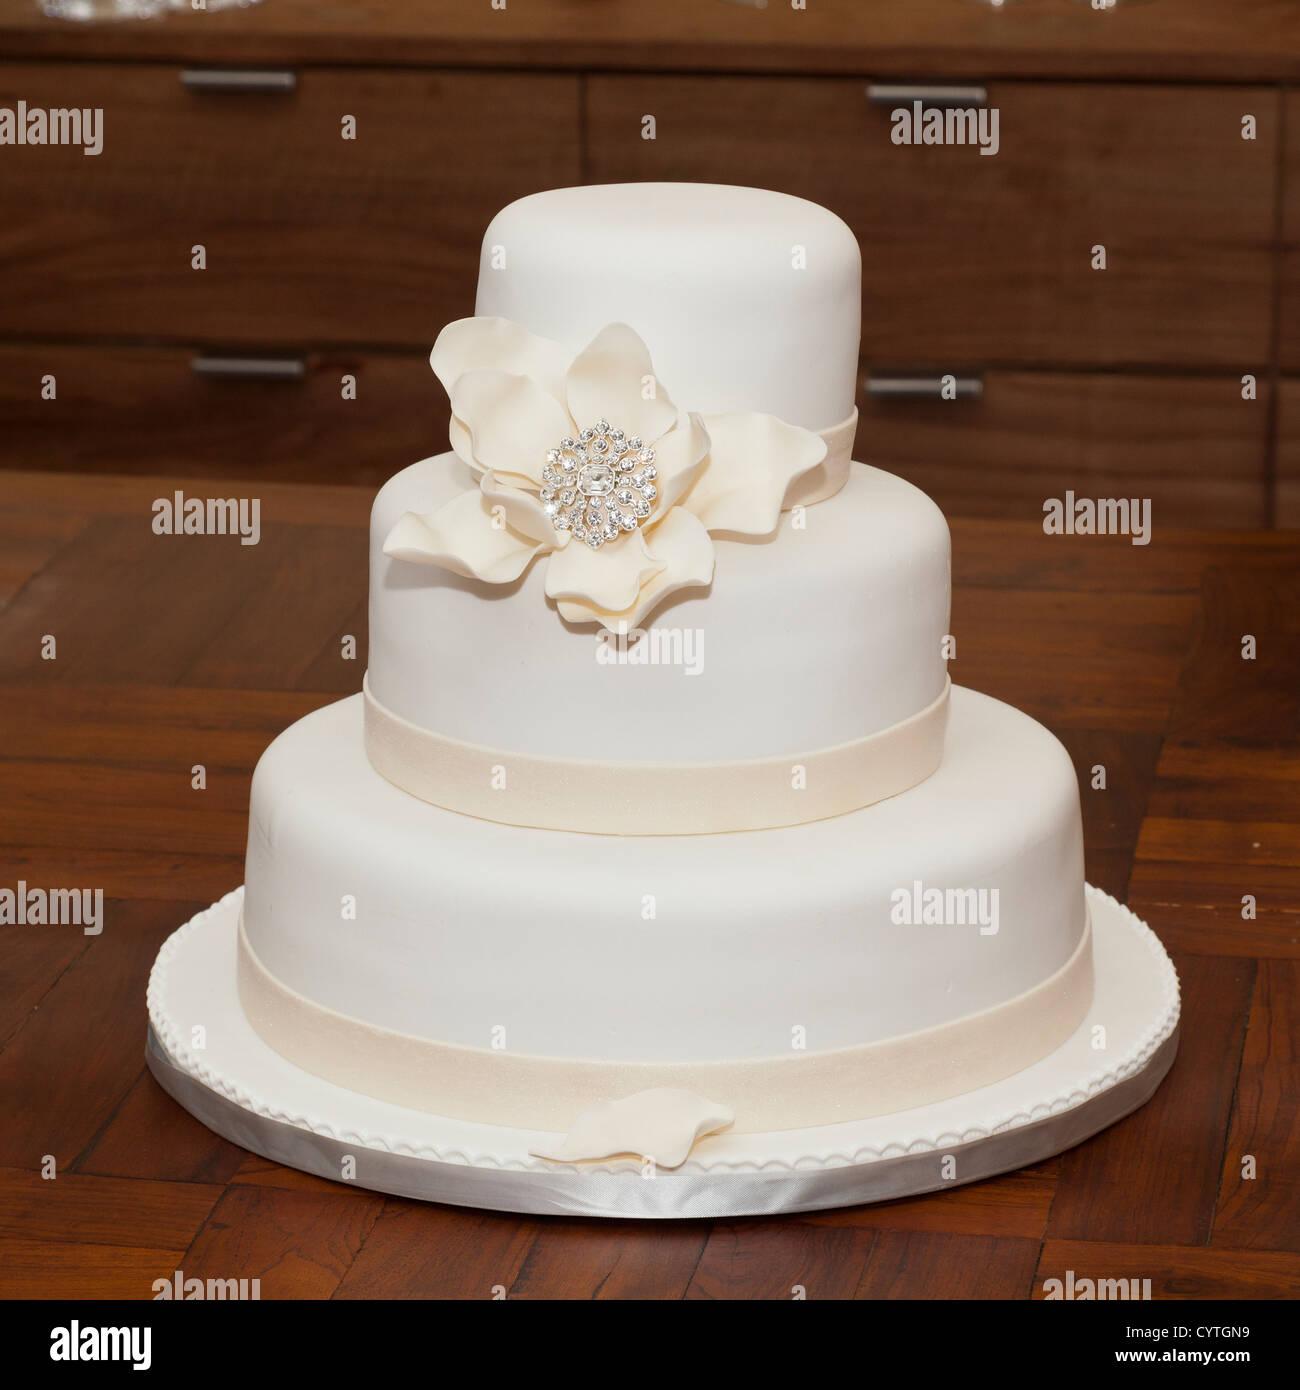 Fancy Wedding Cake Tree Cornus Controversa Variegata Mold - Wedding ...